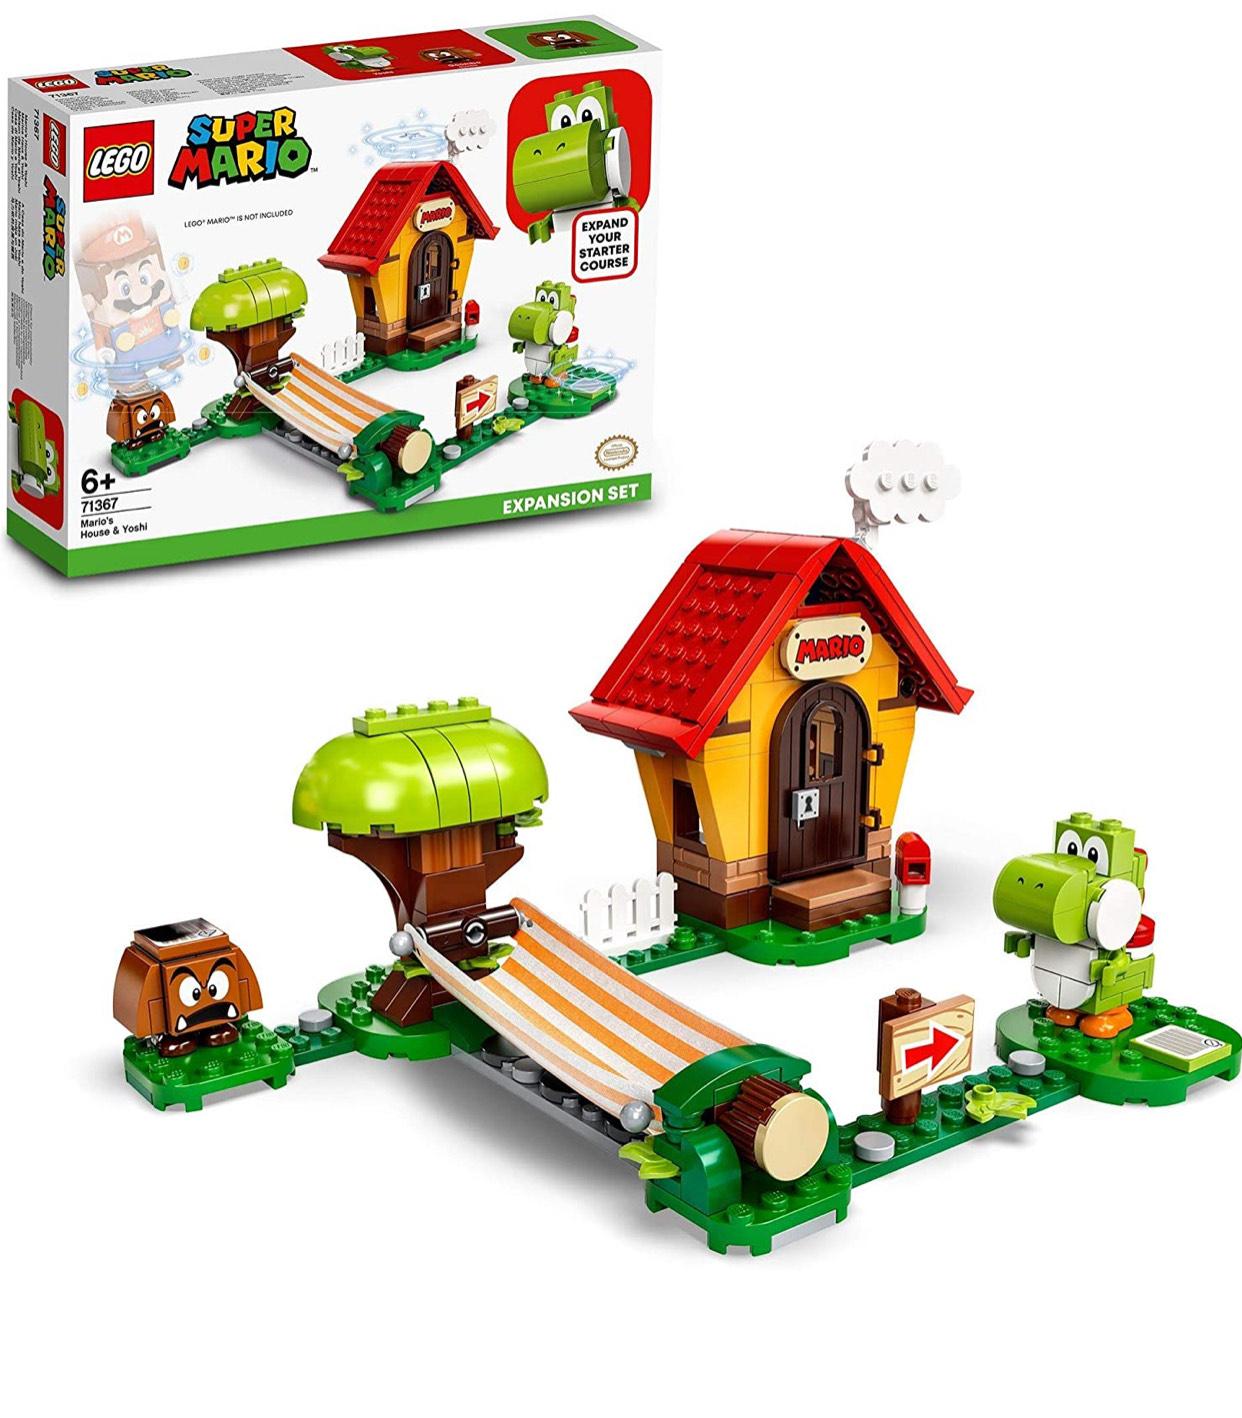 LEGO 71367 Super Mario House & Yoshi Expansion Set £17.50 (+£4.49 Non Prime) at Amazon